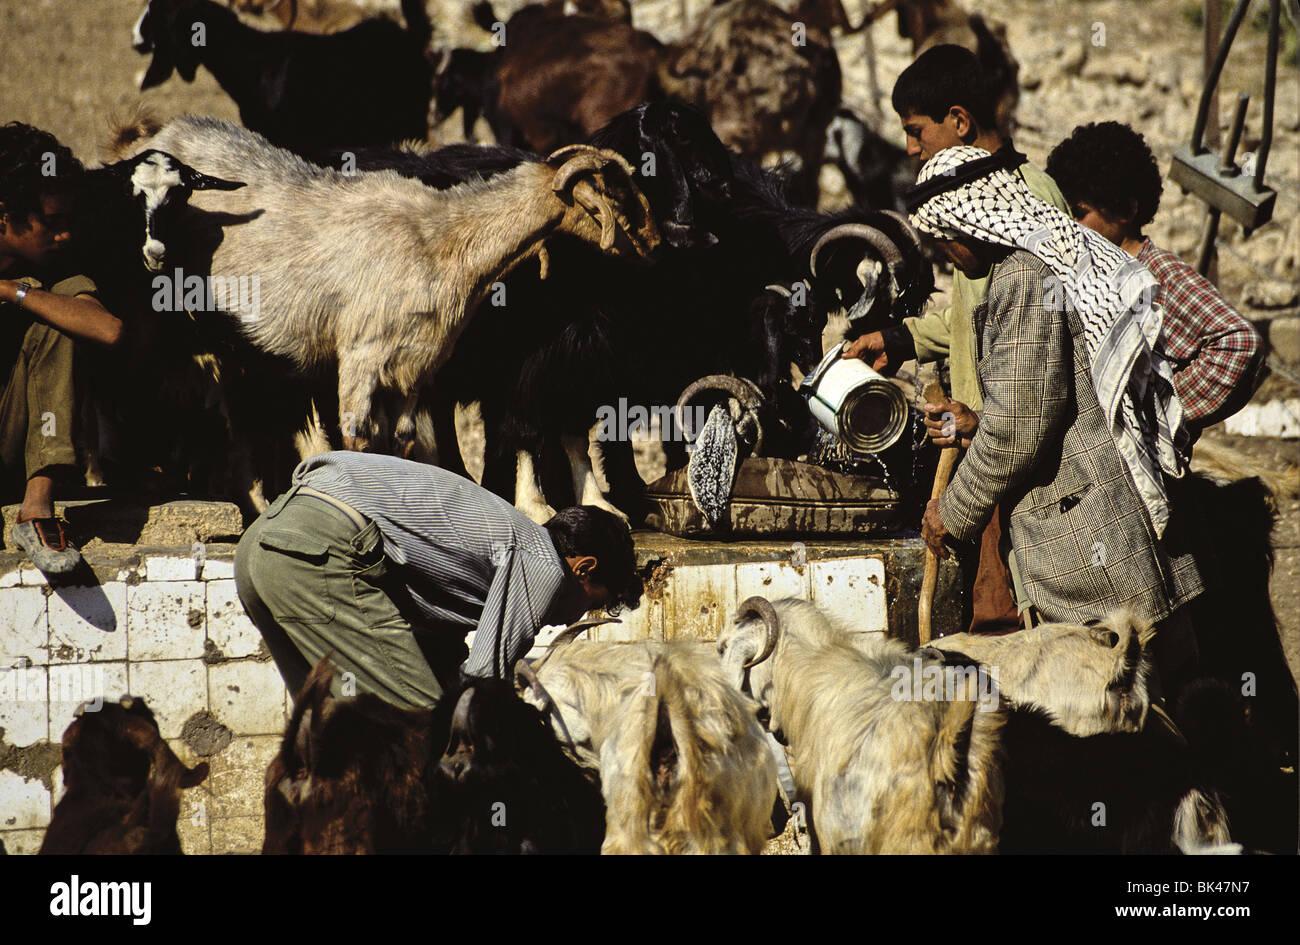 Herd of goats drinking water, Jordan - Stock Image